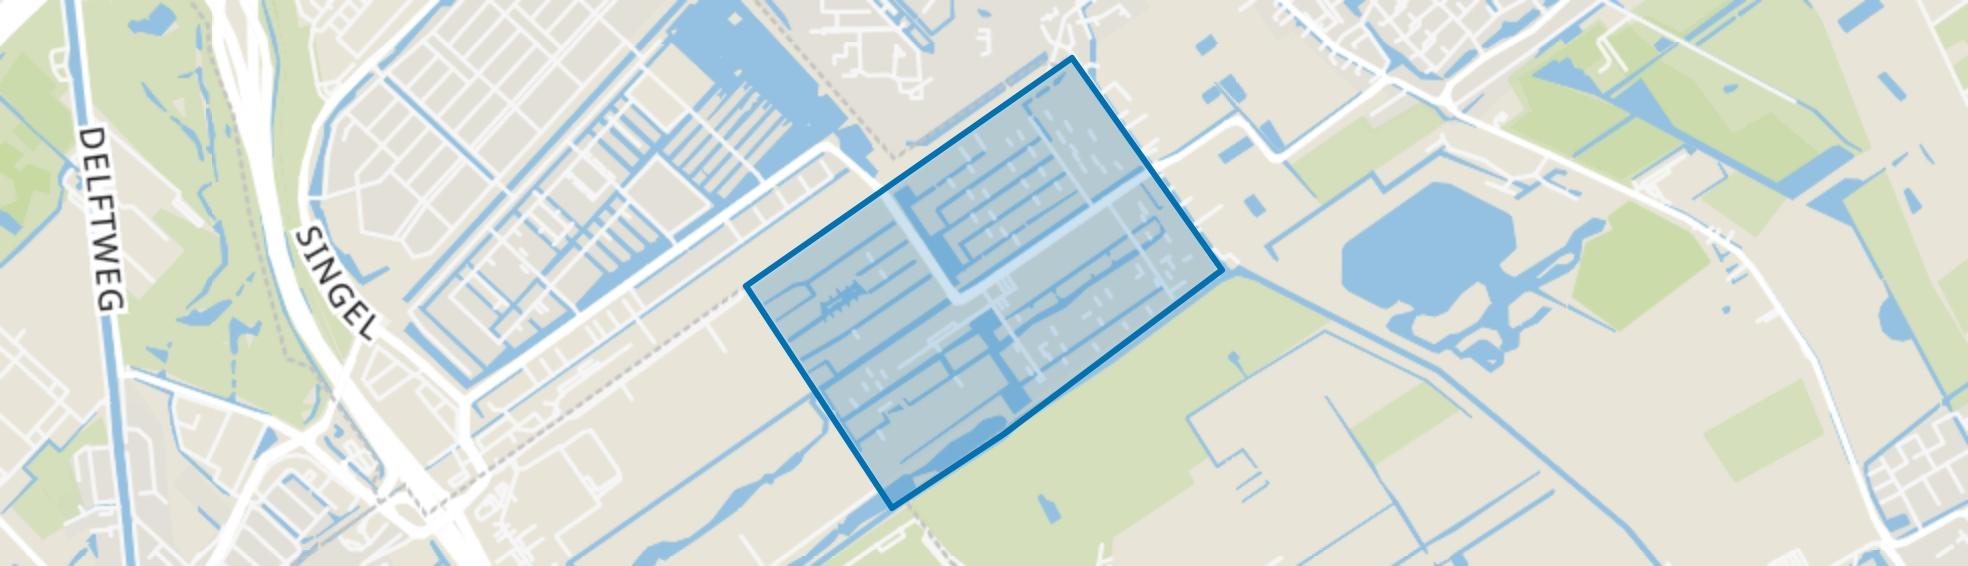 De Bras, Den Haag map